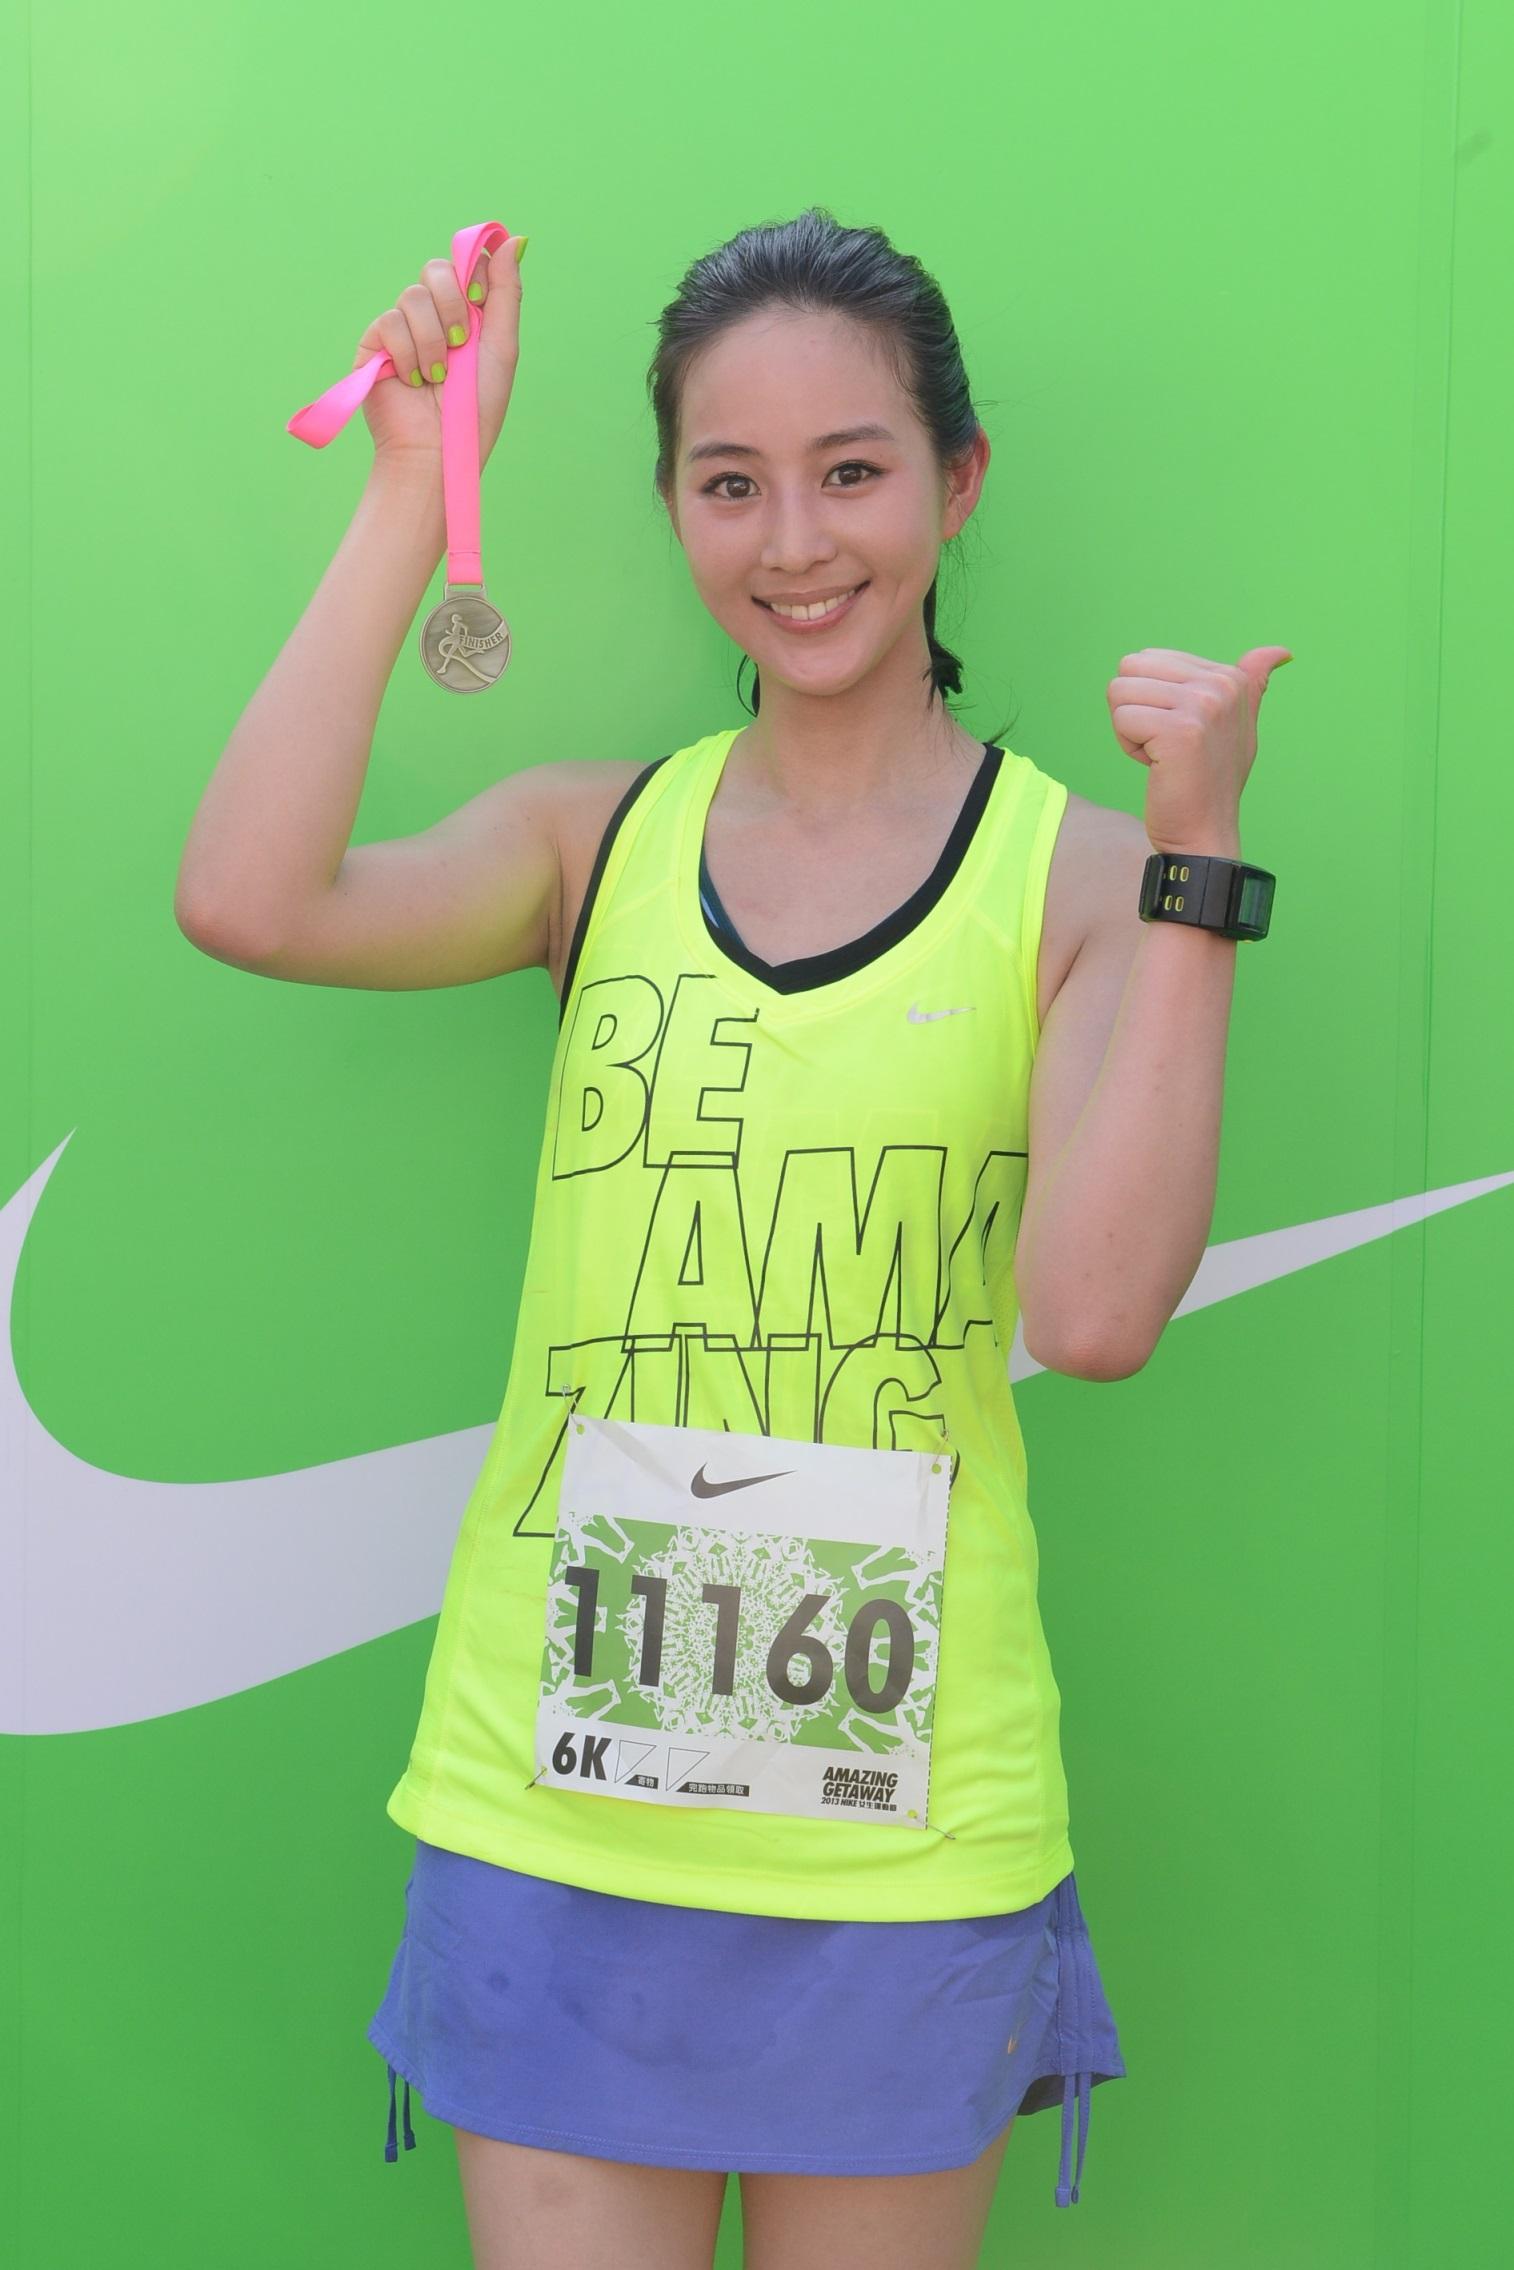 quot;台湾第一气质美女quot;张钧甯:用跑步释放自己